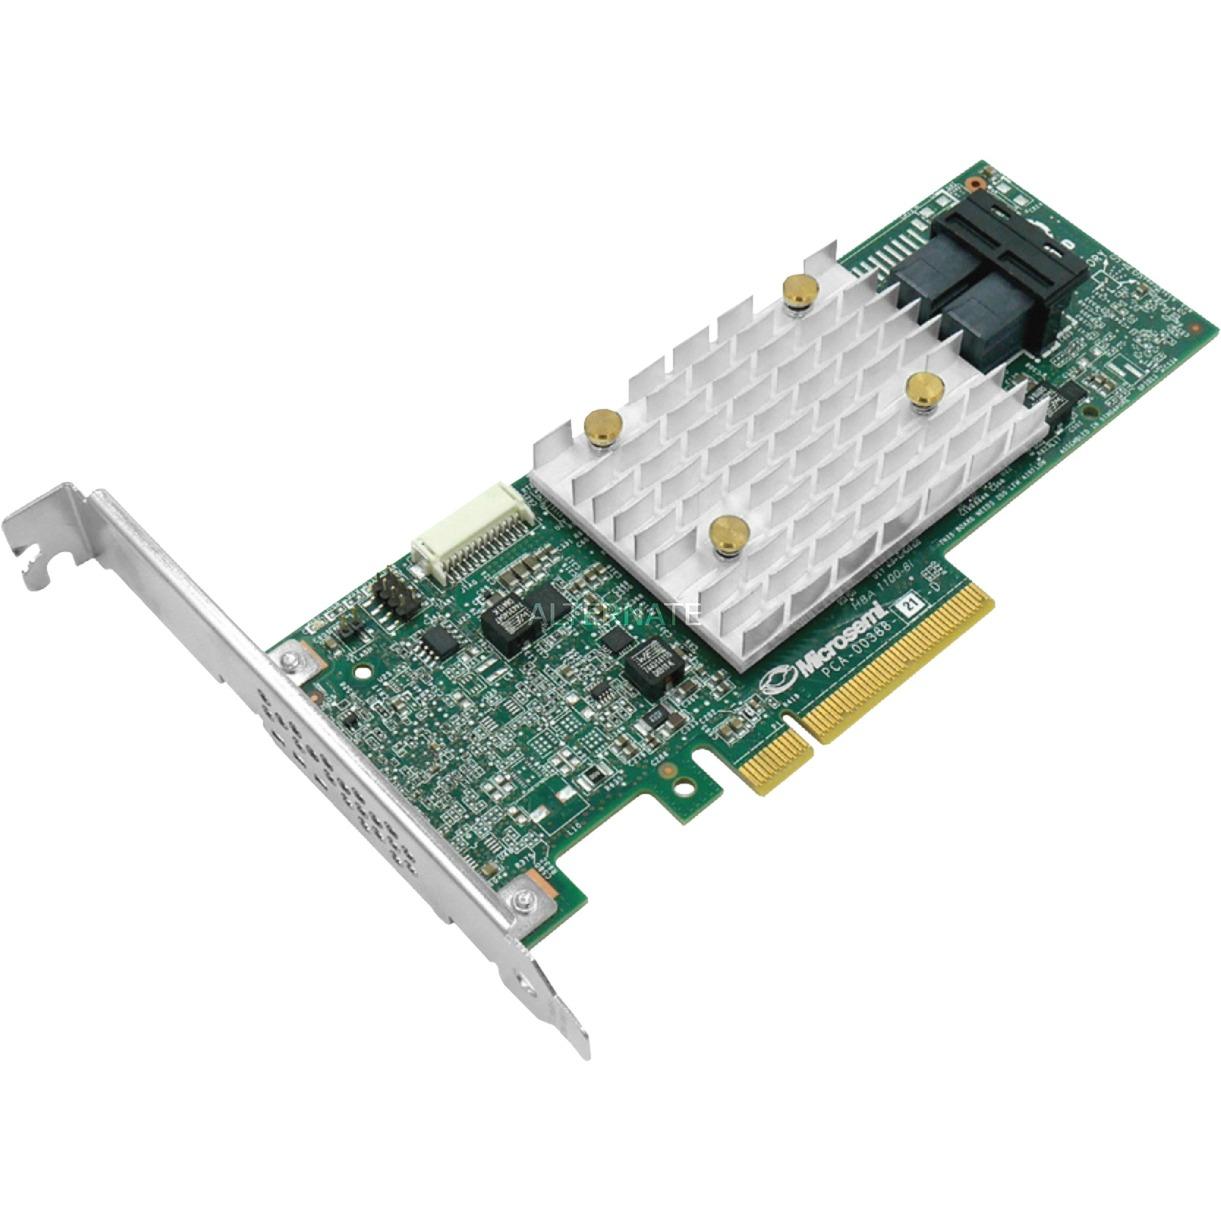 HBA 1100-8i tarjeta y adaptador de interfaz Mini-SAS HD Interno, Controlador